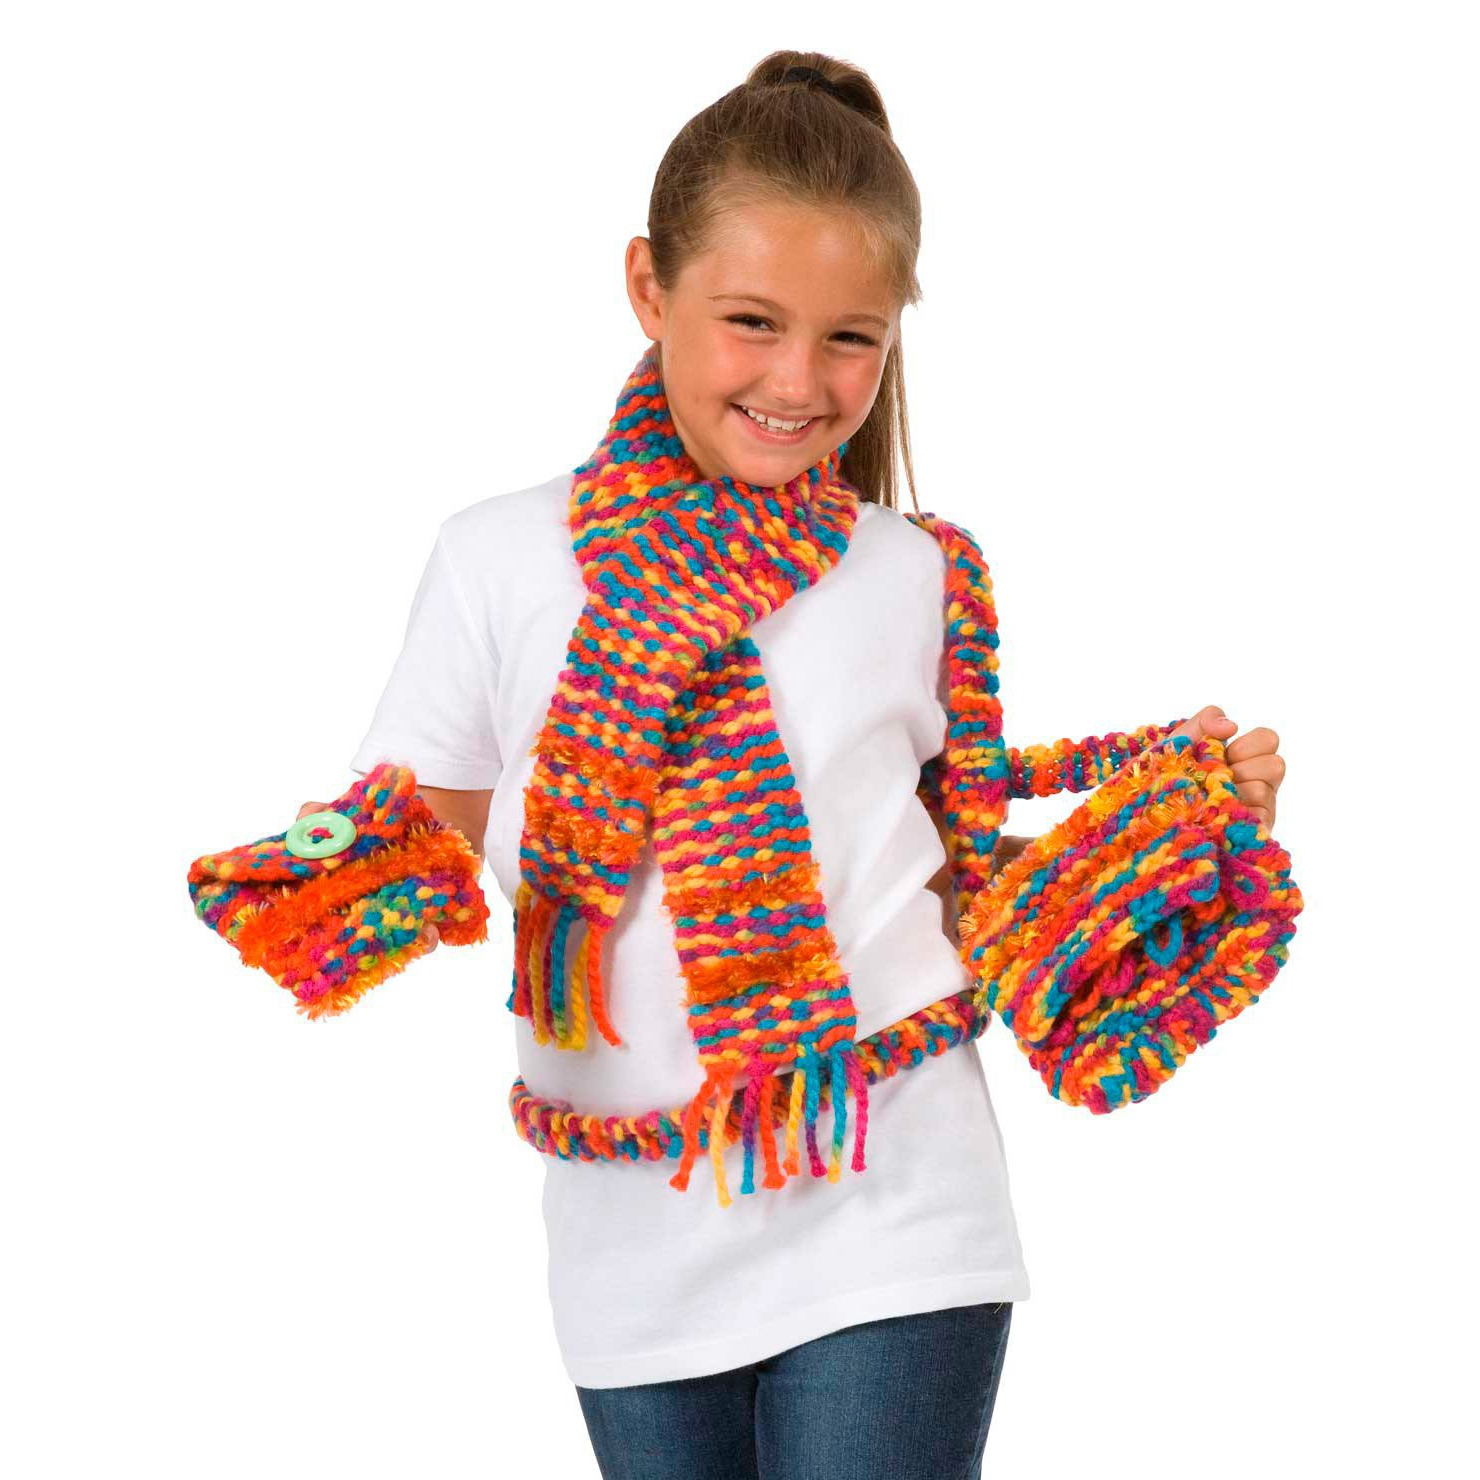 Children's Fashion Weaving Loom 4